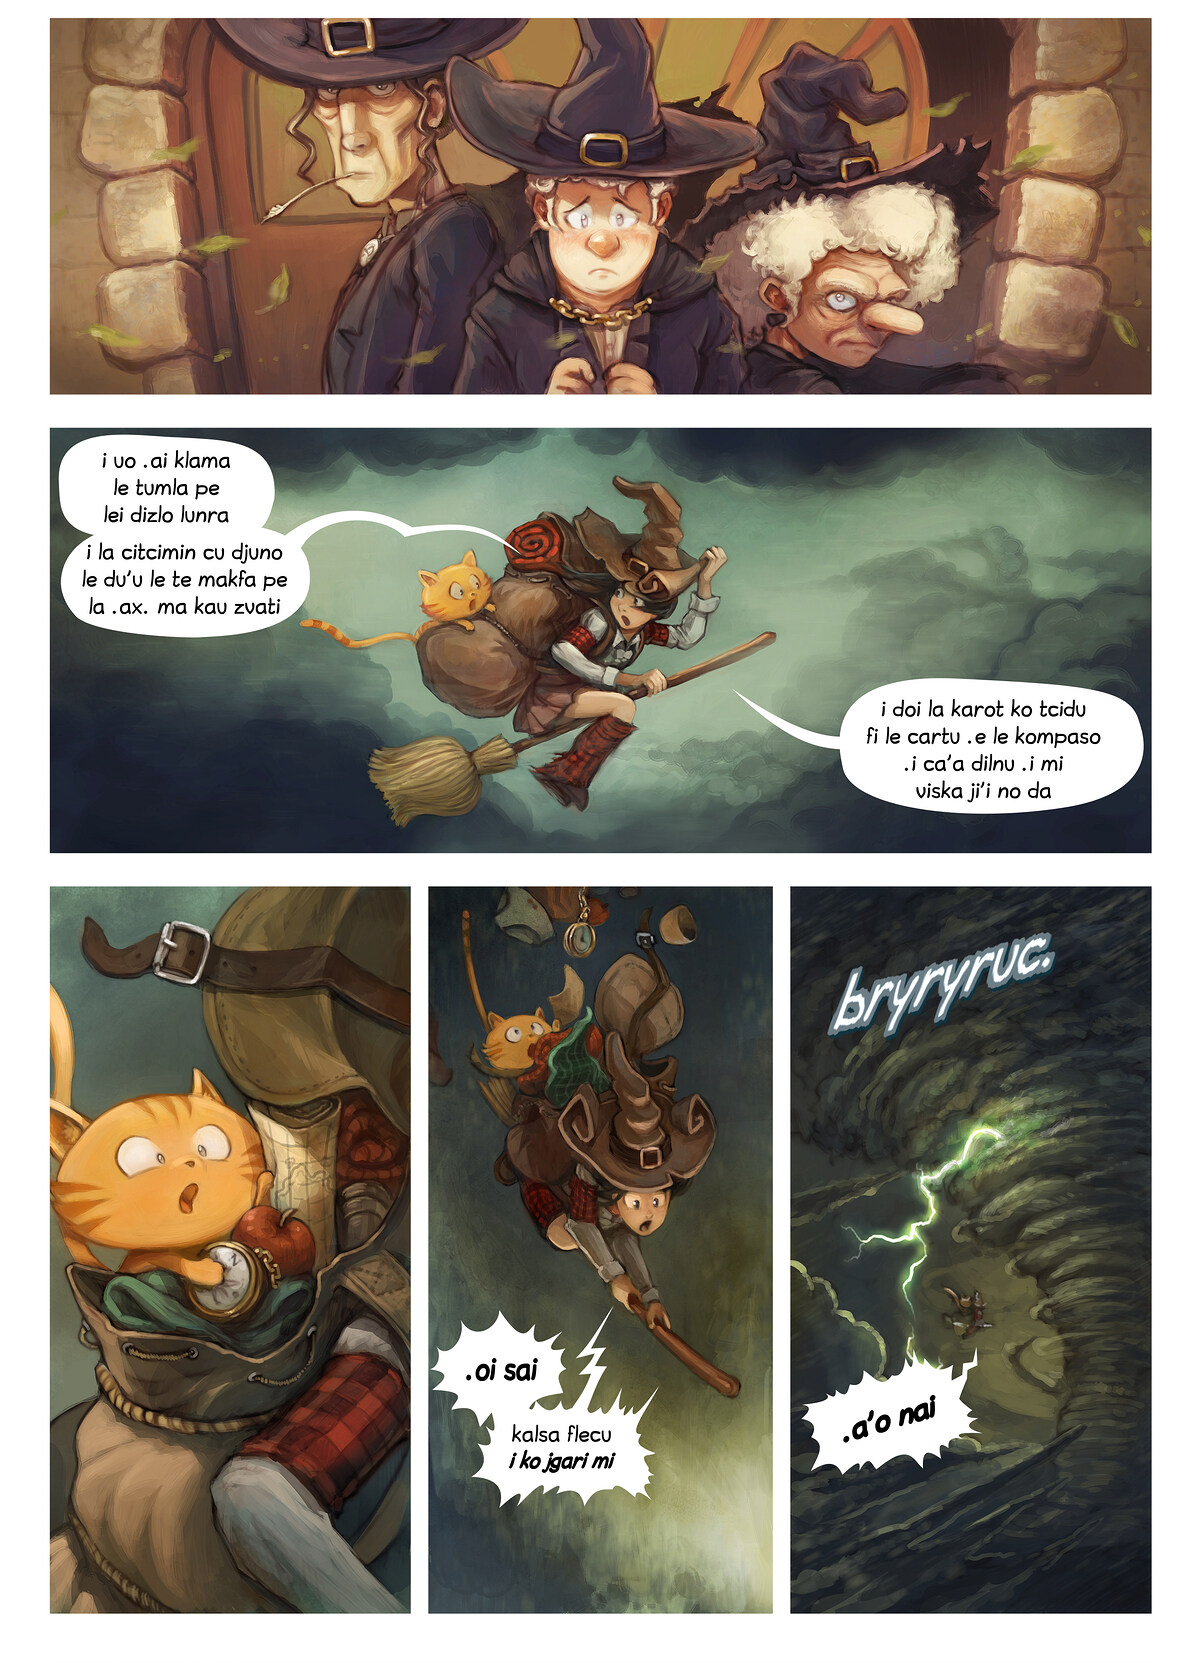 A webcomic page of Pepper&Carrot, pagbu 17 [jb], papri 2